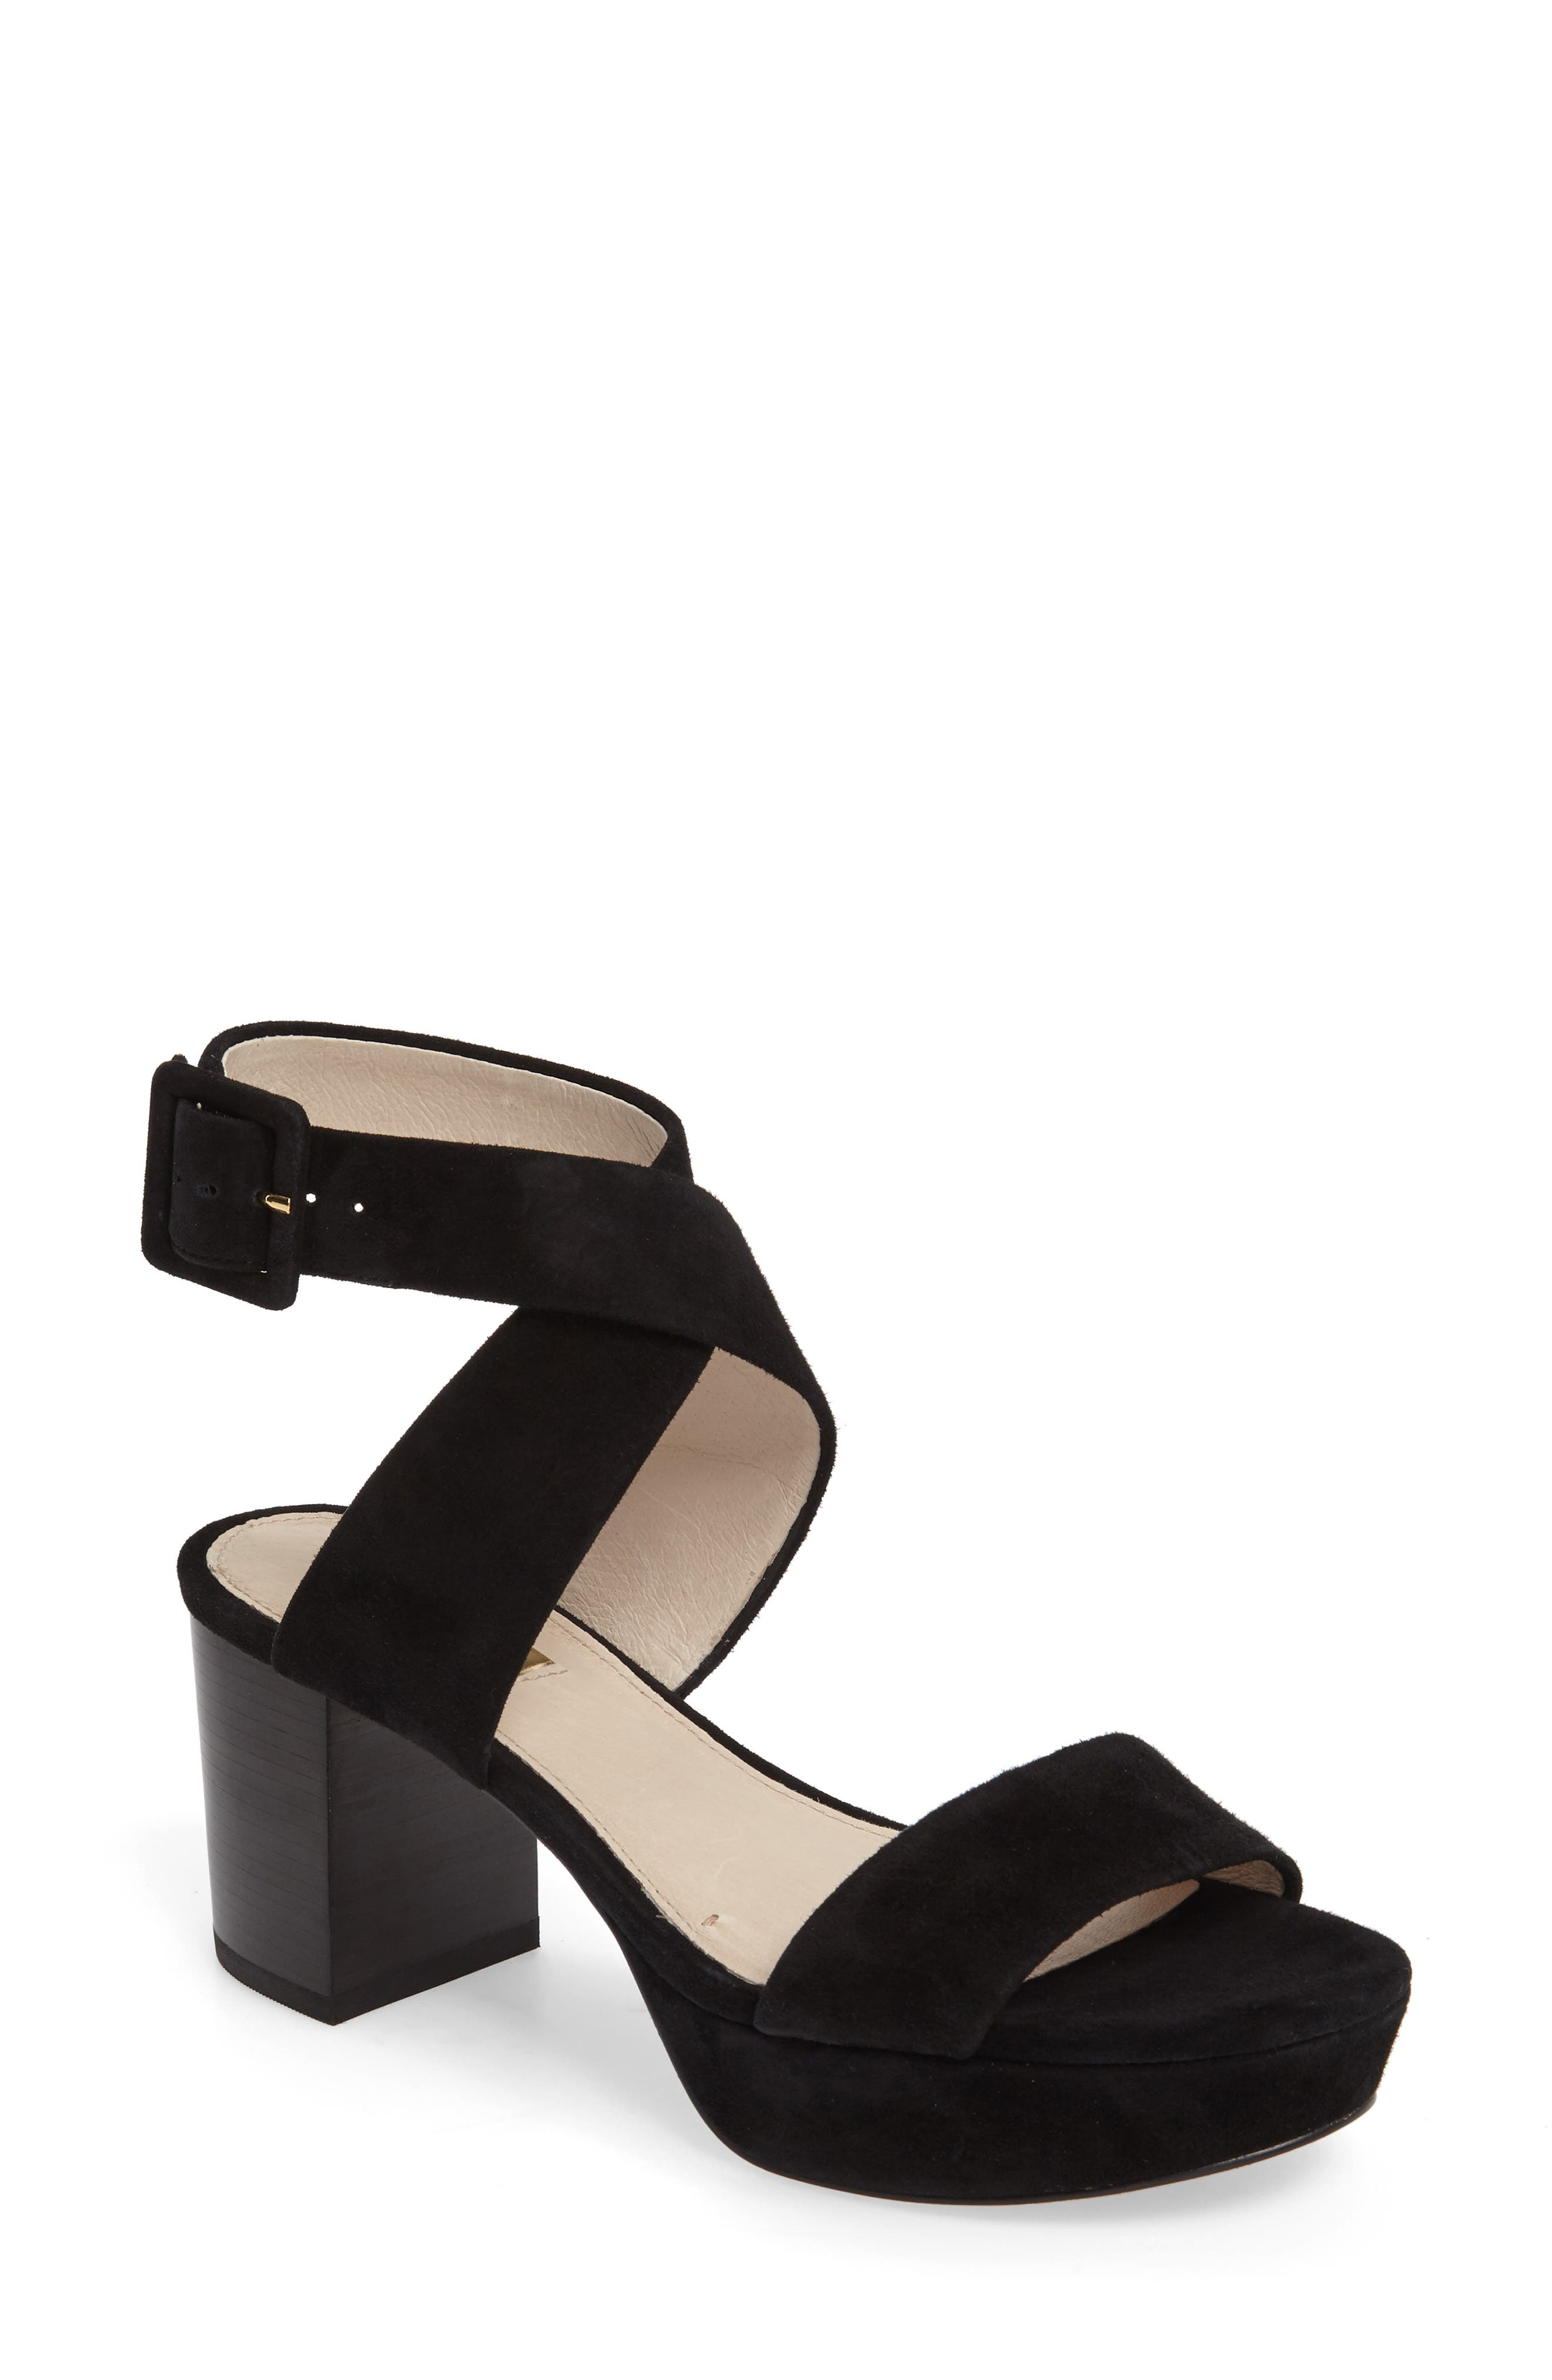 Main Image - Louise et Cie Harmony Block Heel Sandal (Women)